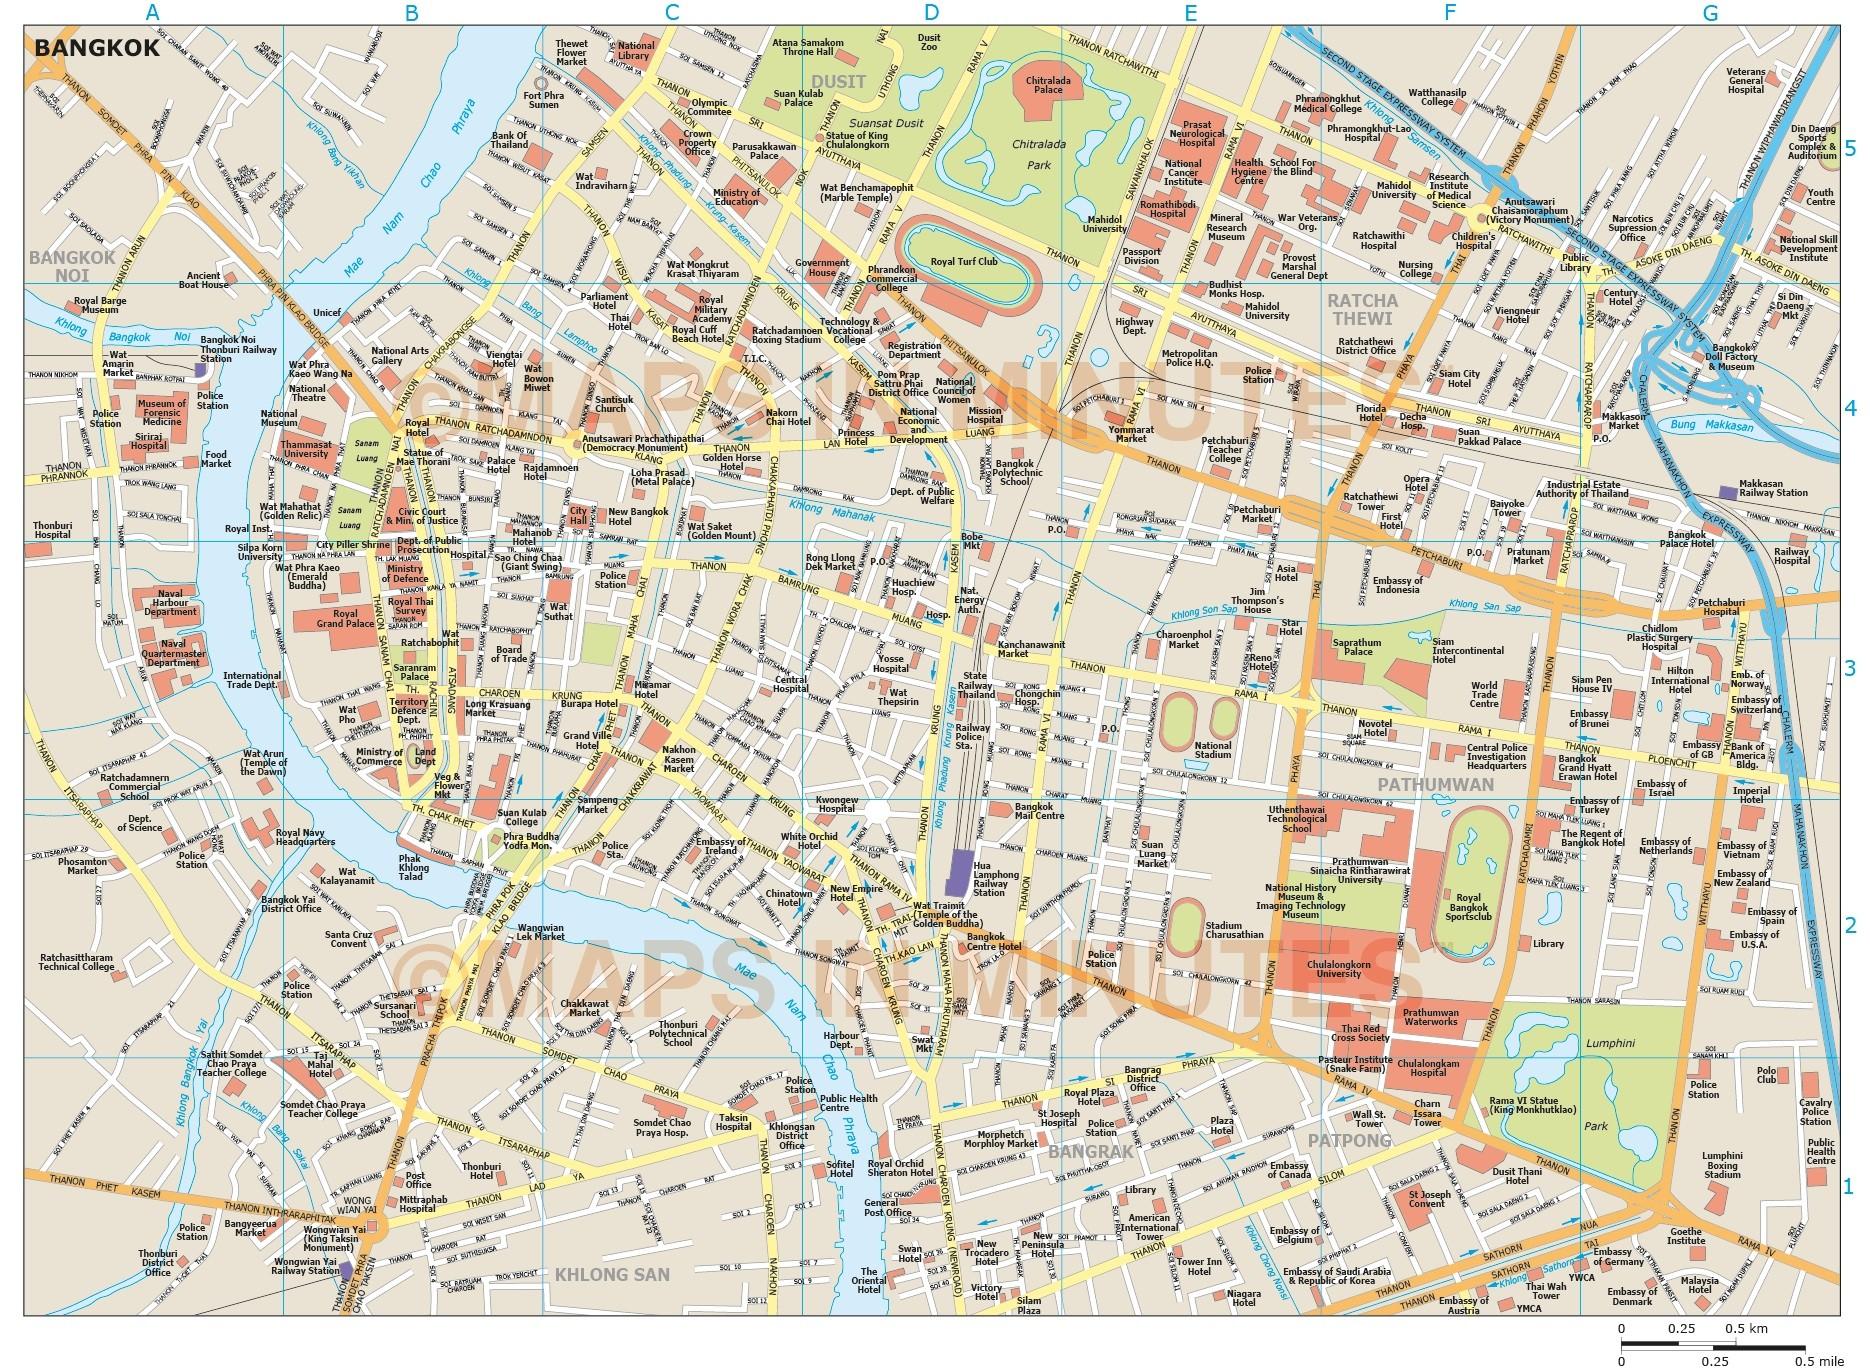 Bangkok city map bangkok city map in illustrator cs or pdf vector format gumiabroncs Gallery